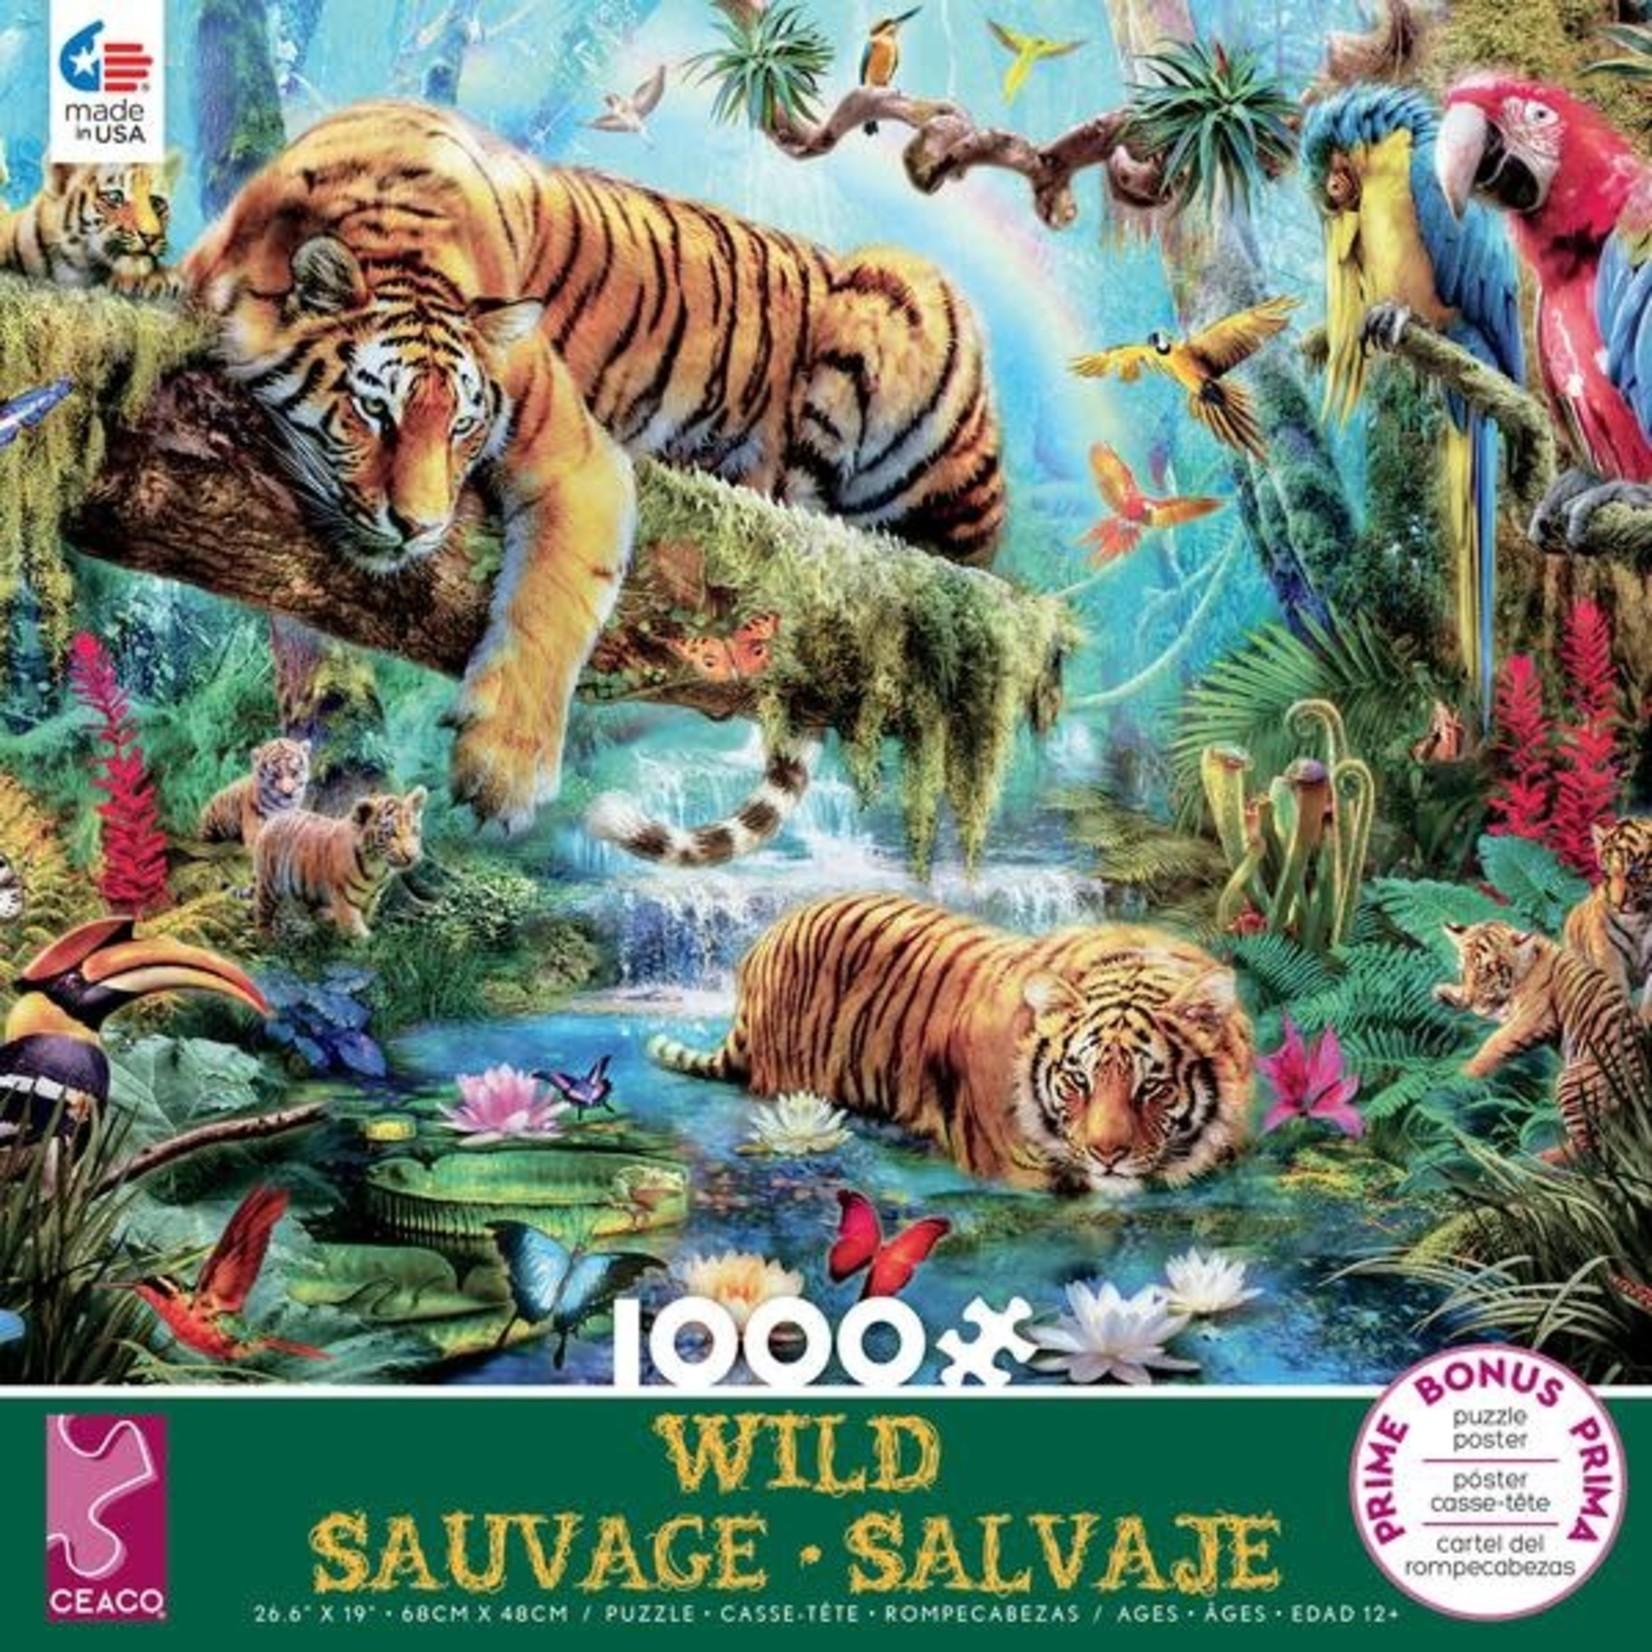 CEACO Idyllic Tiger Wild 1000pc